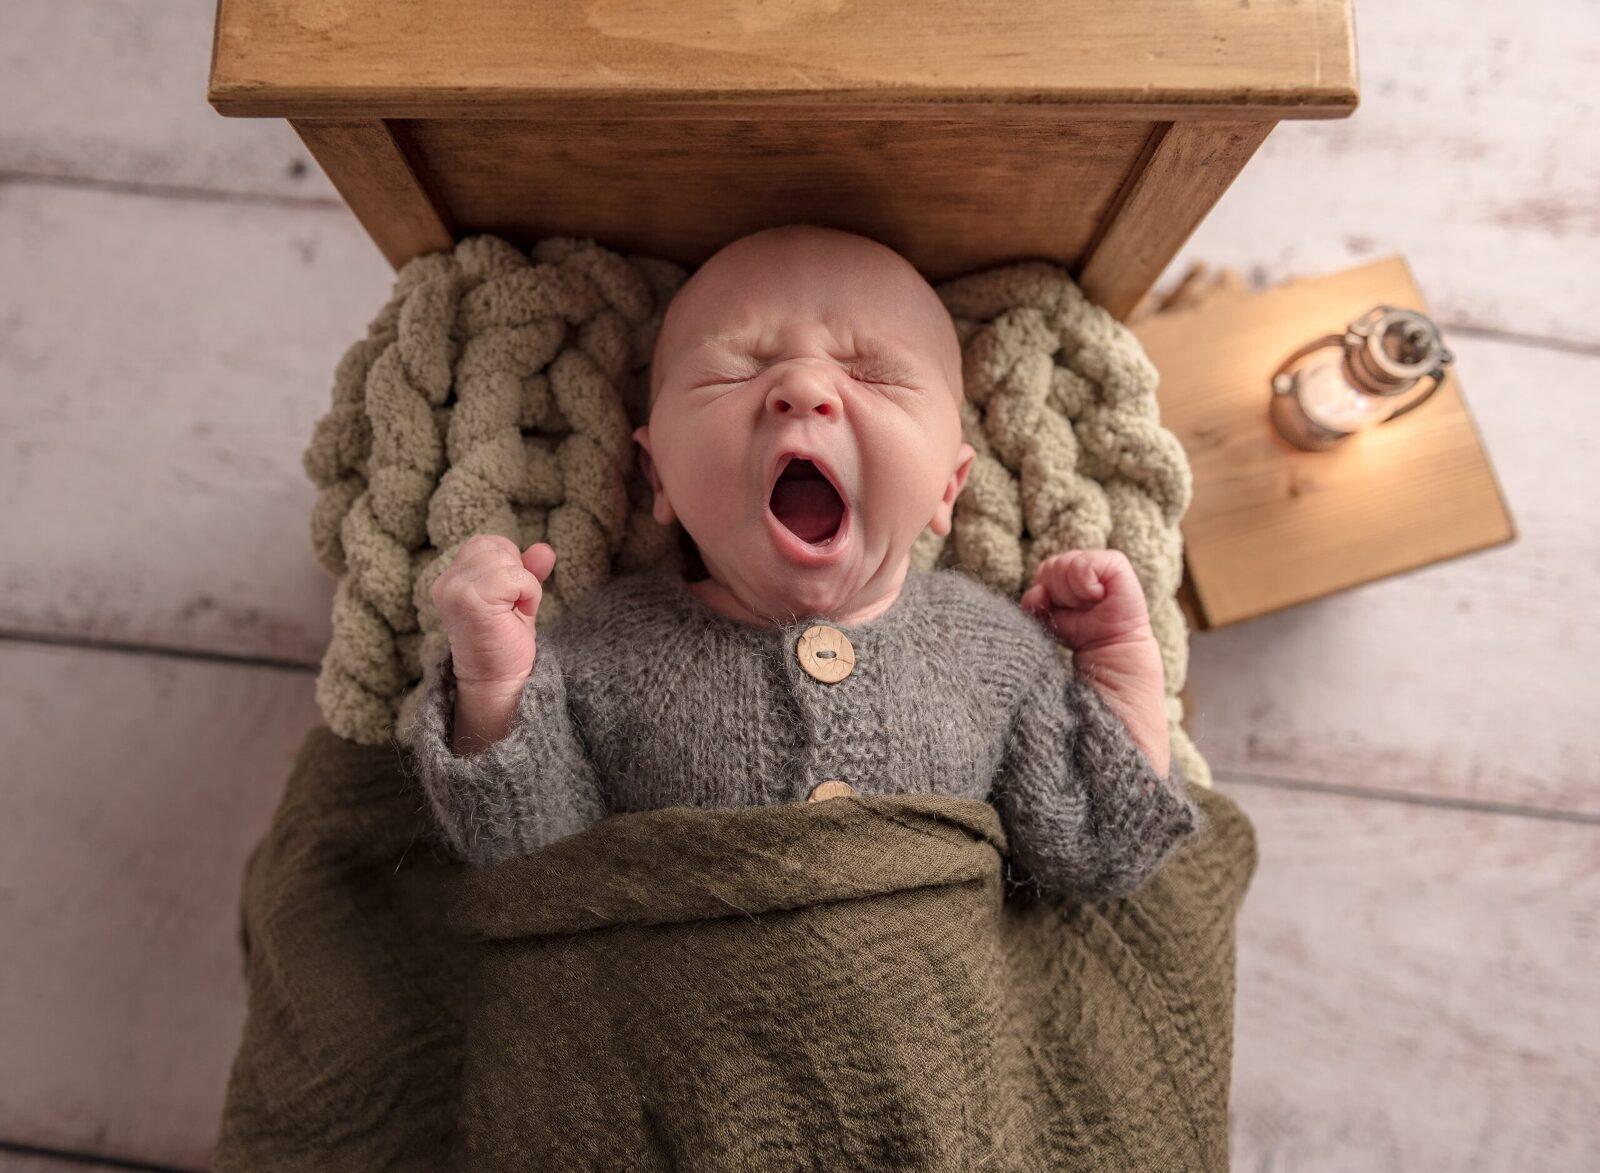 newborn baby boy in little bed yawning